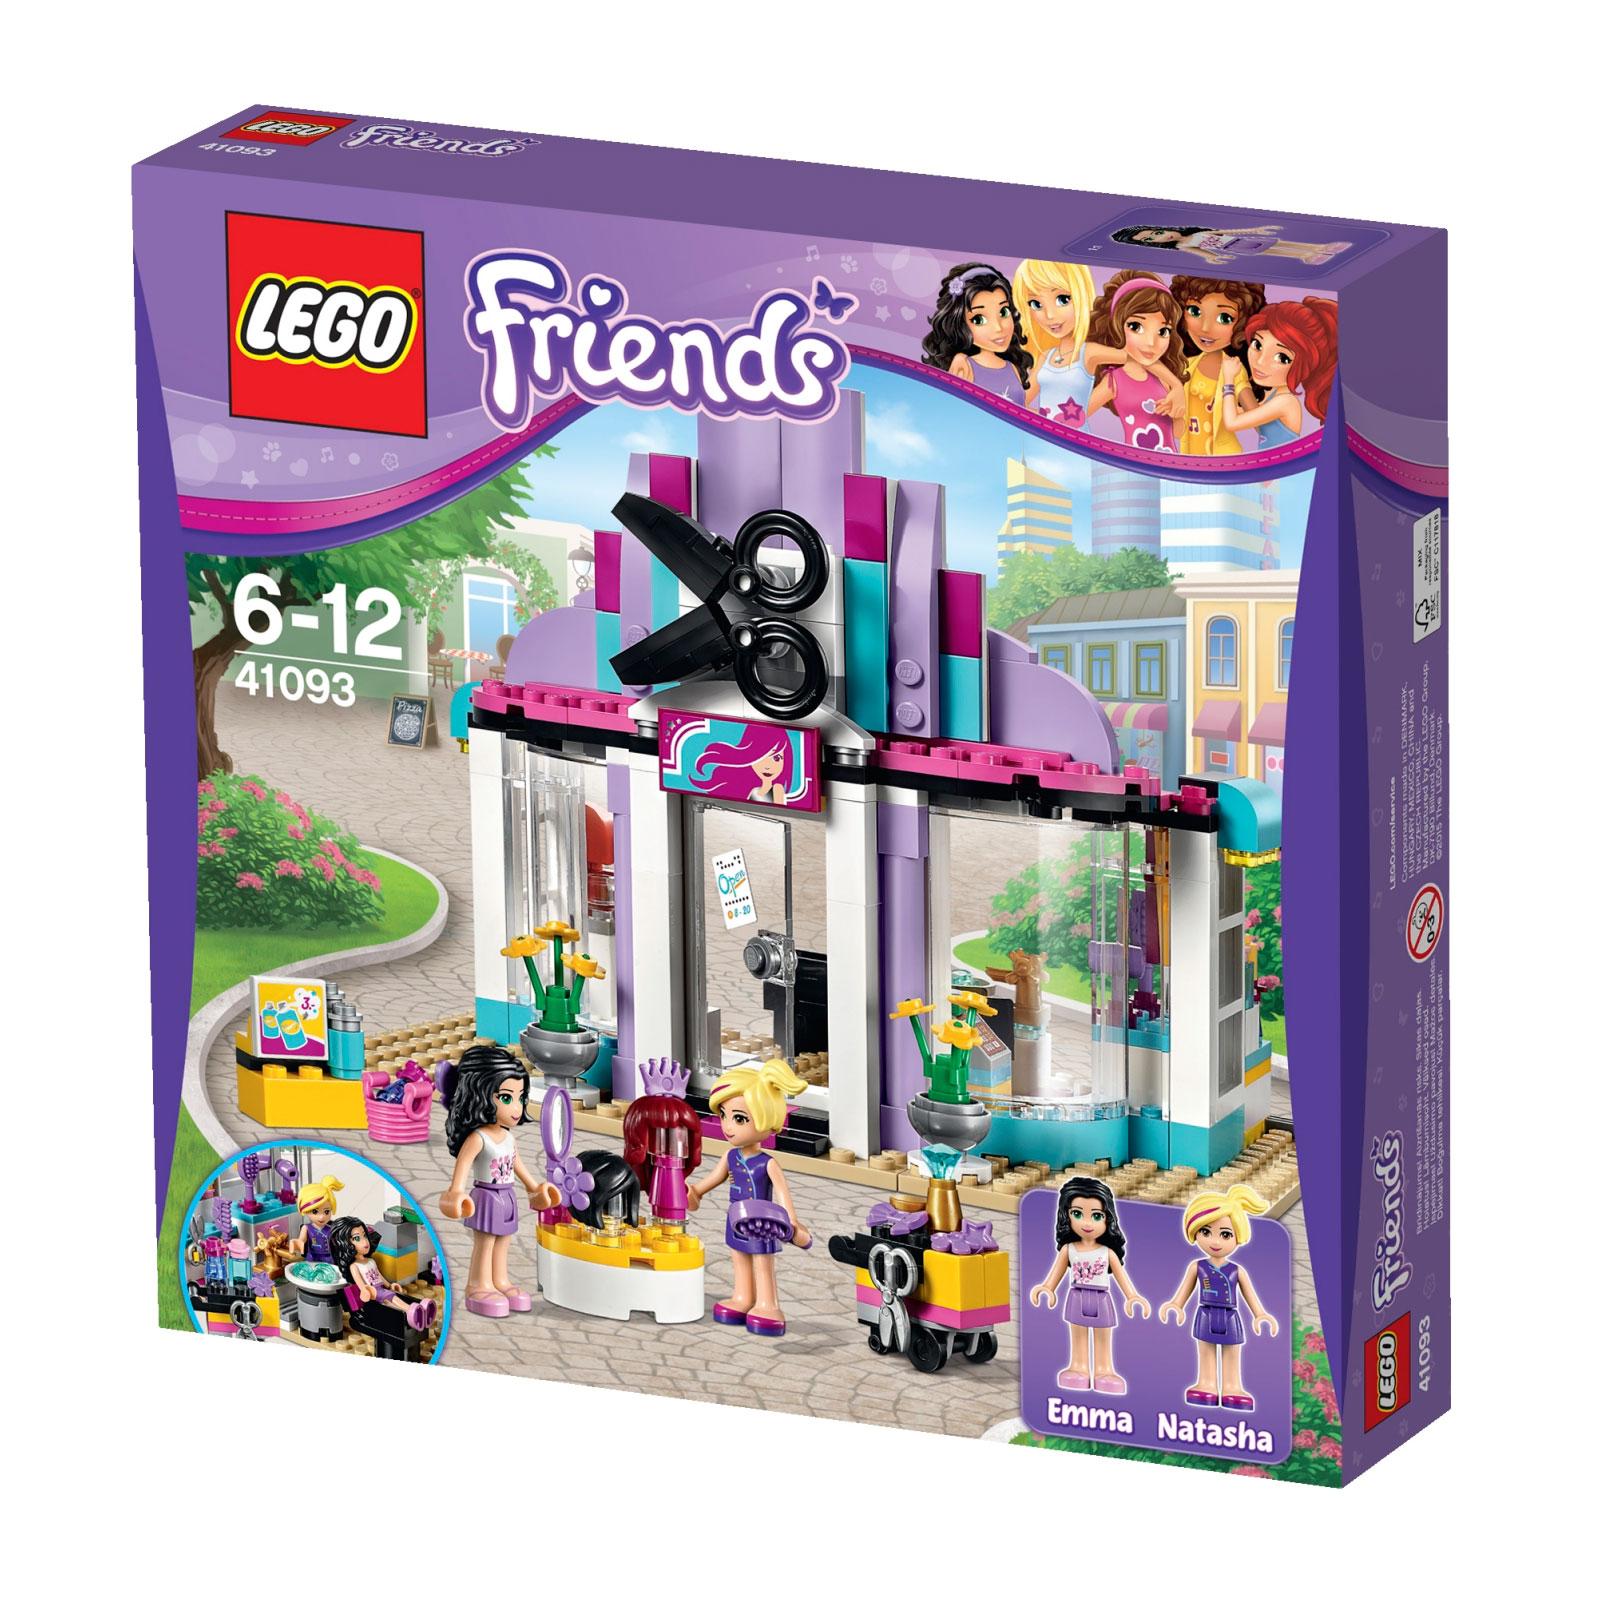 ����������� LEGO Friends 41093 ��������������